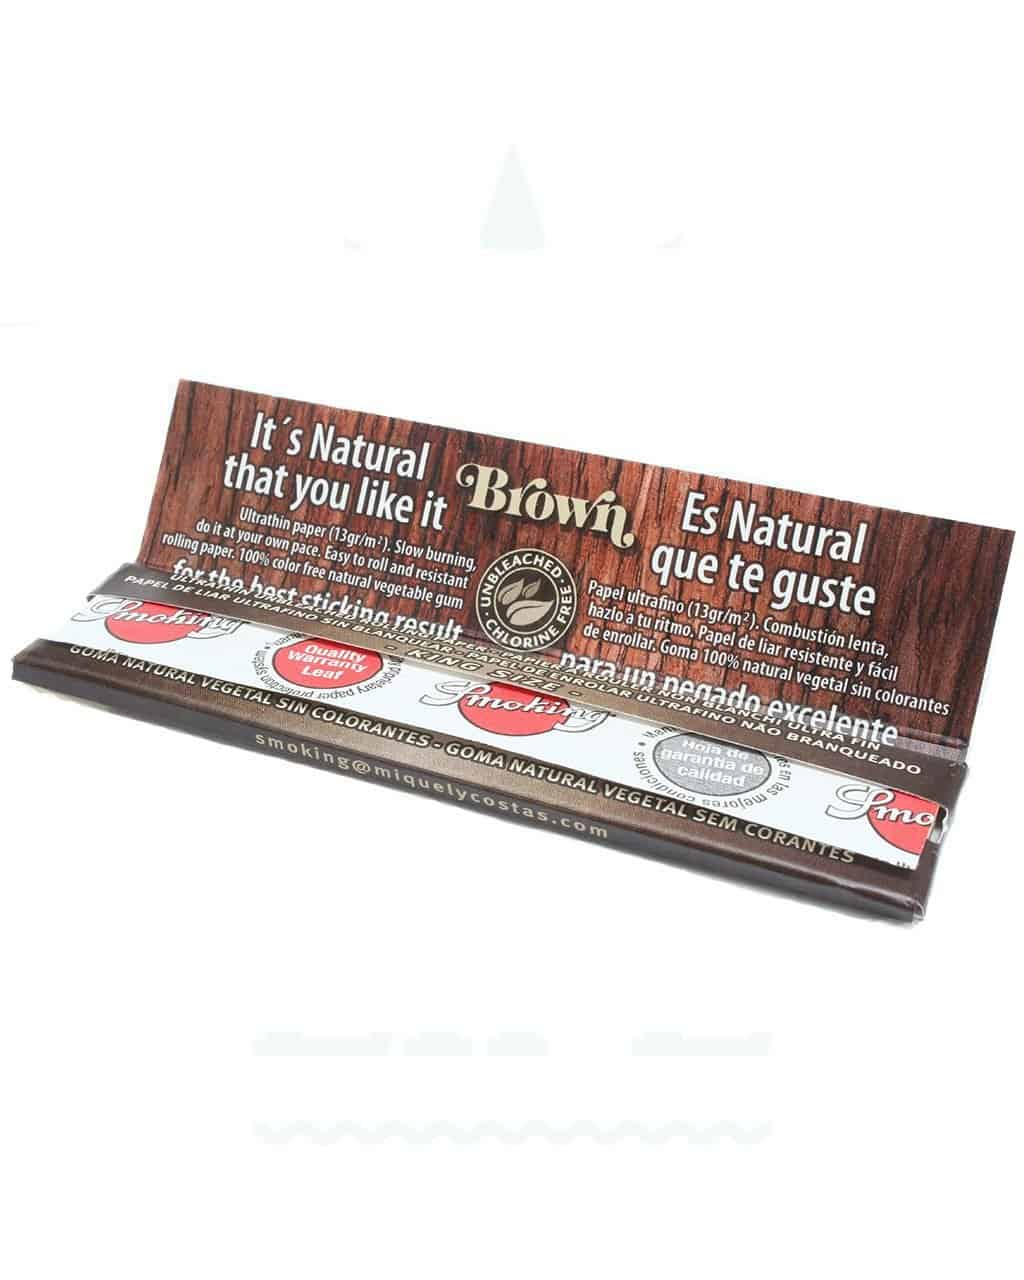 Beliebte Marken SMOKING 'Brown' King Size Papers    33 Blatt